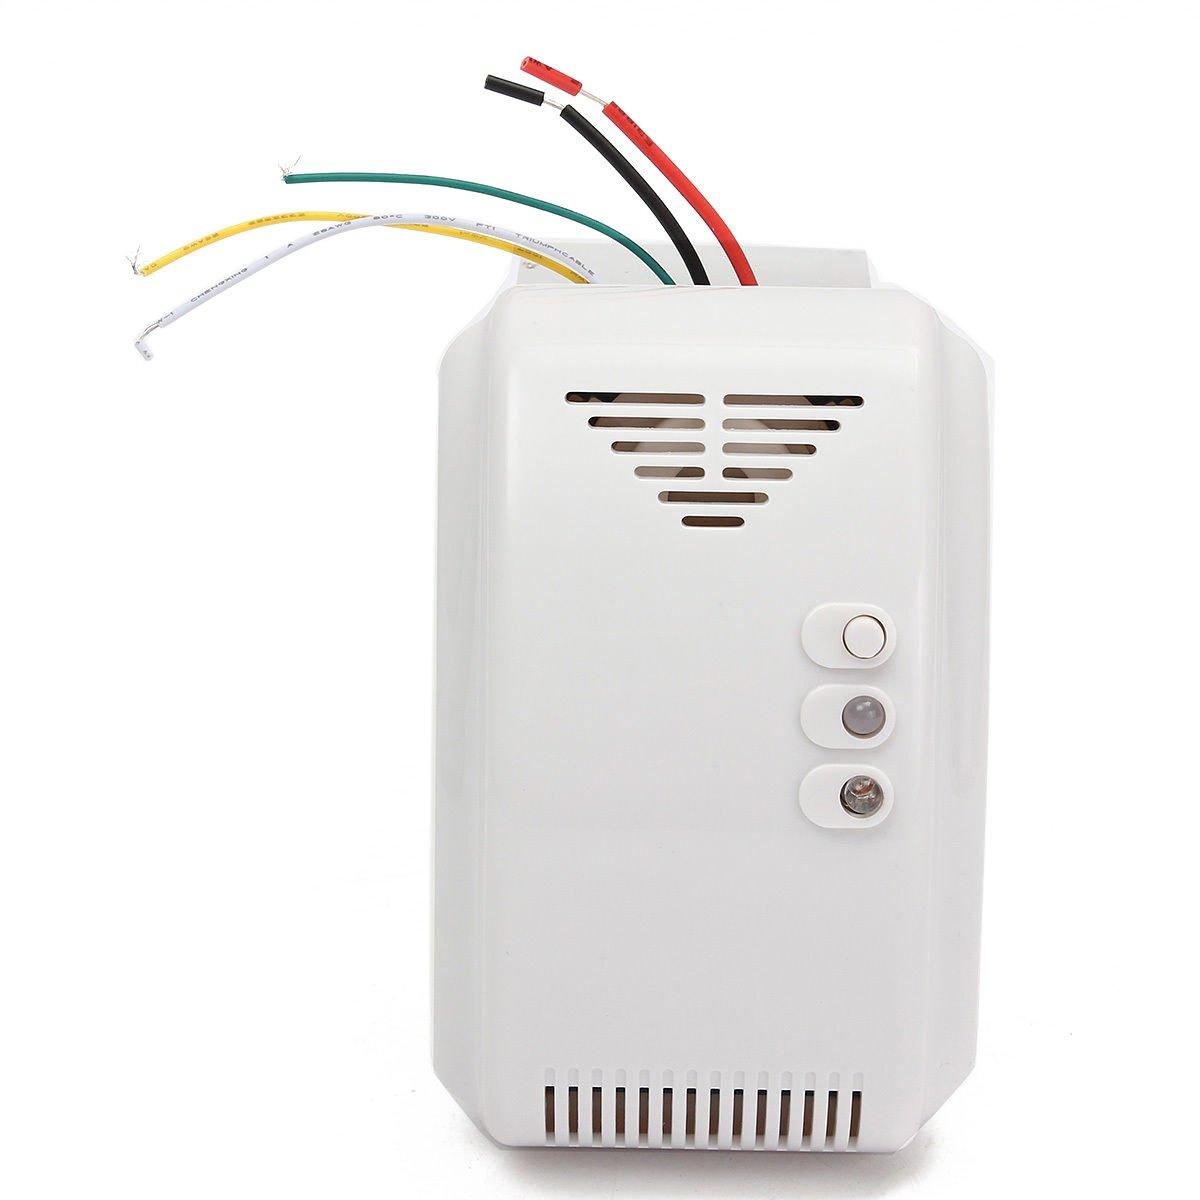 Gas Leak Detector High Sensitivity White 12V Combustible Gas Leak LPG Natural Gas Detector Propane Alarm by Liushuliang (Image #1)